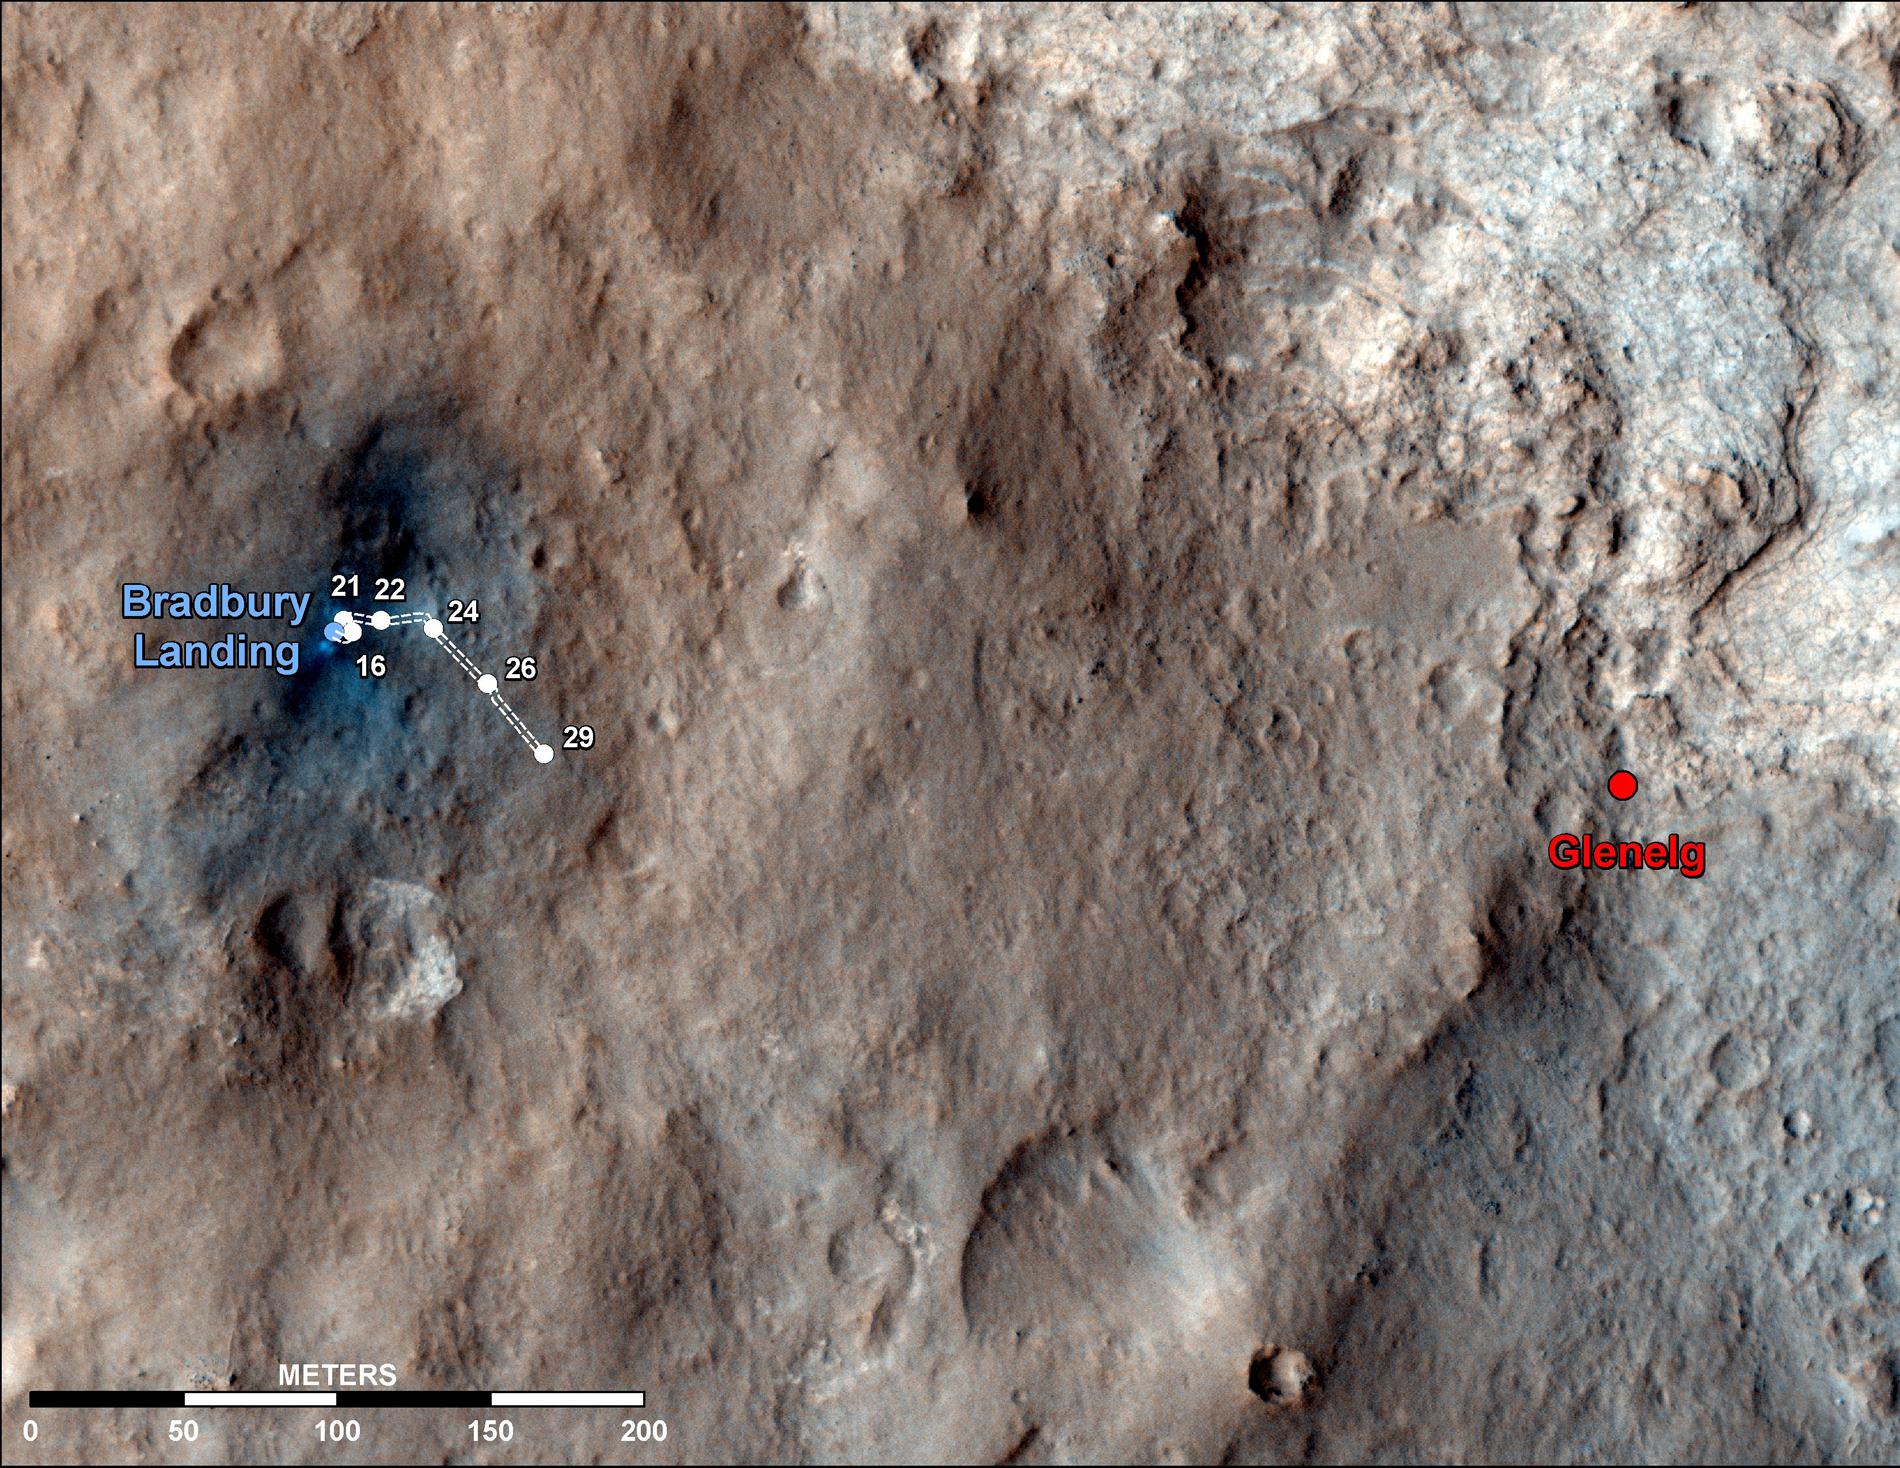 Mars Rover Curiosity's 1st Drive Map